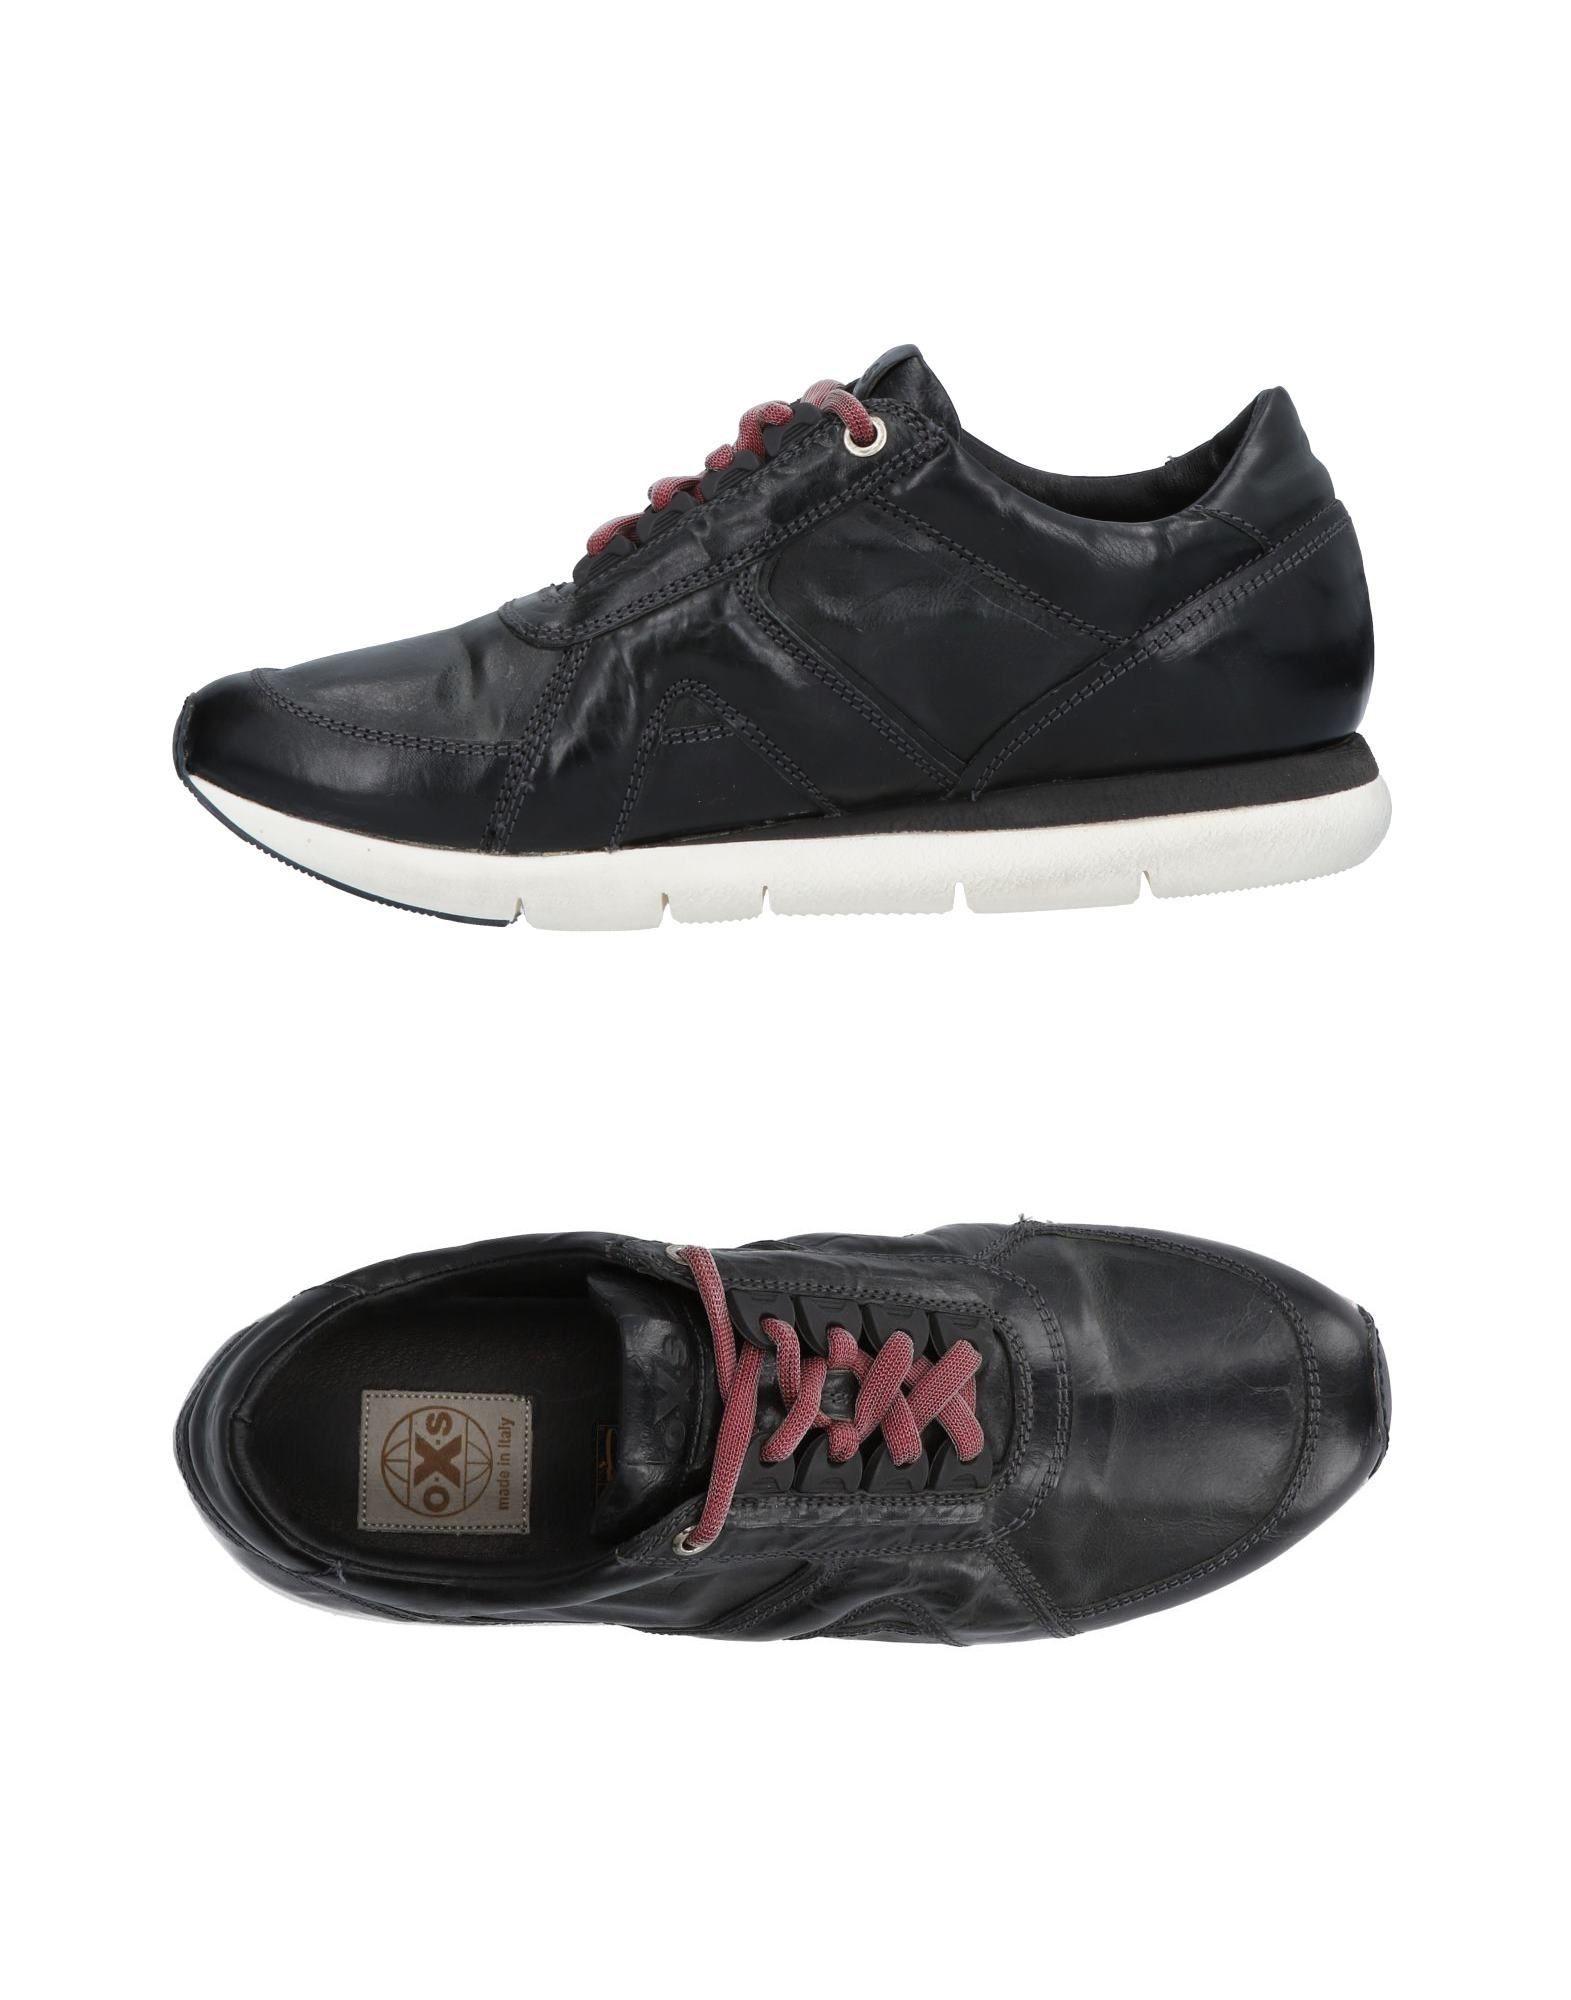 O.X.S. Sneakers Herren  beliebte 11468108TG Gute Qualität beliebte  Schuhe 734114